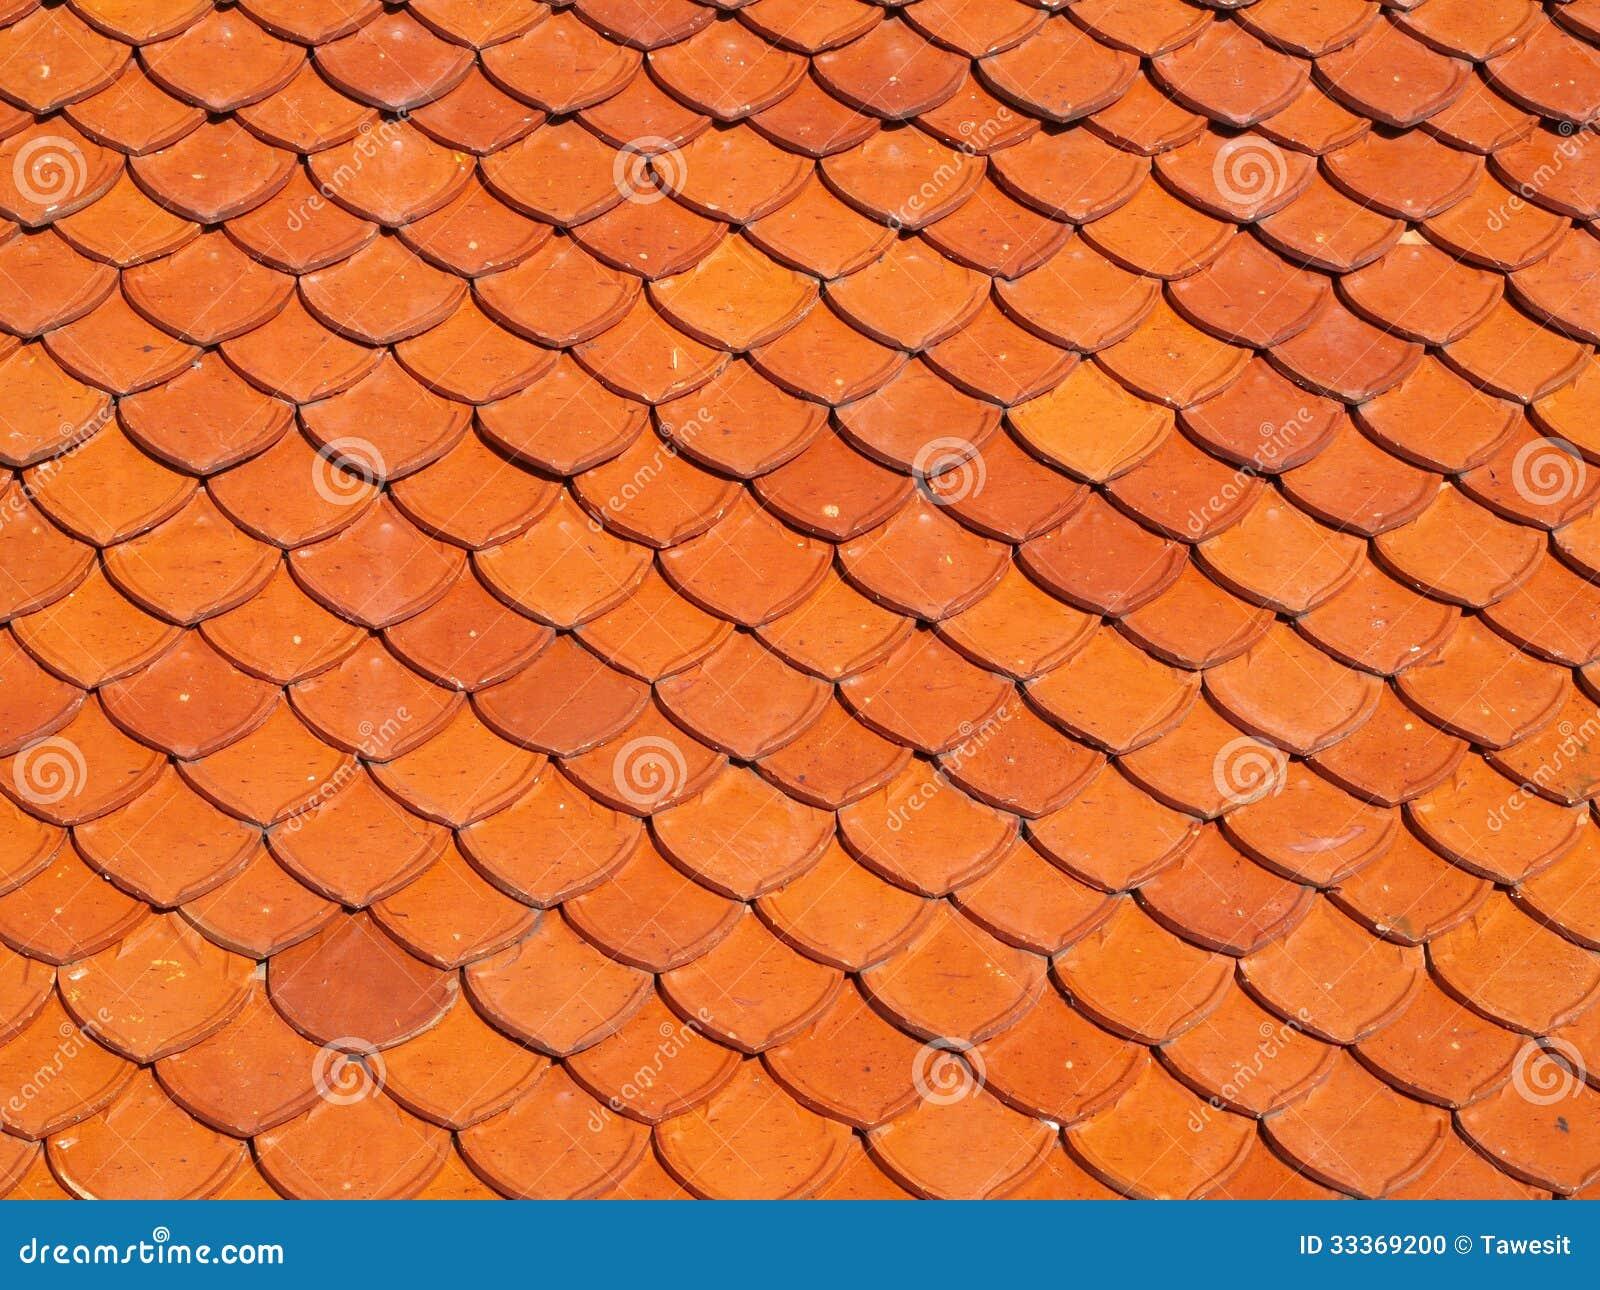 Ceramic Roof Scale Shape Stock Photo Image 33369200